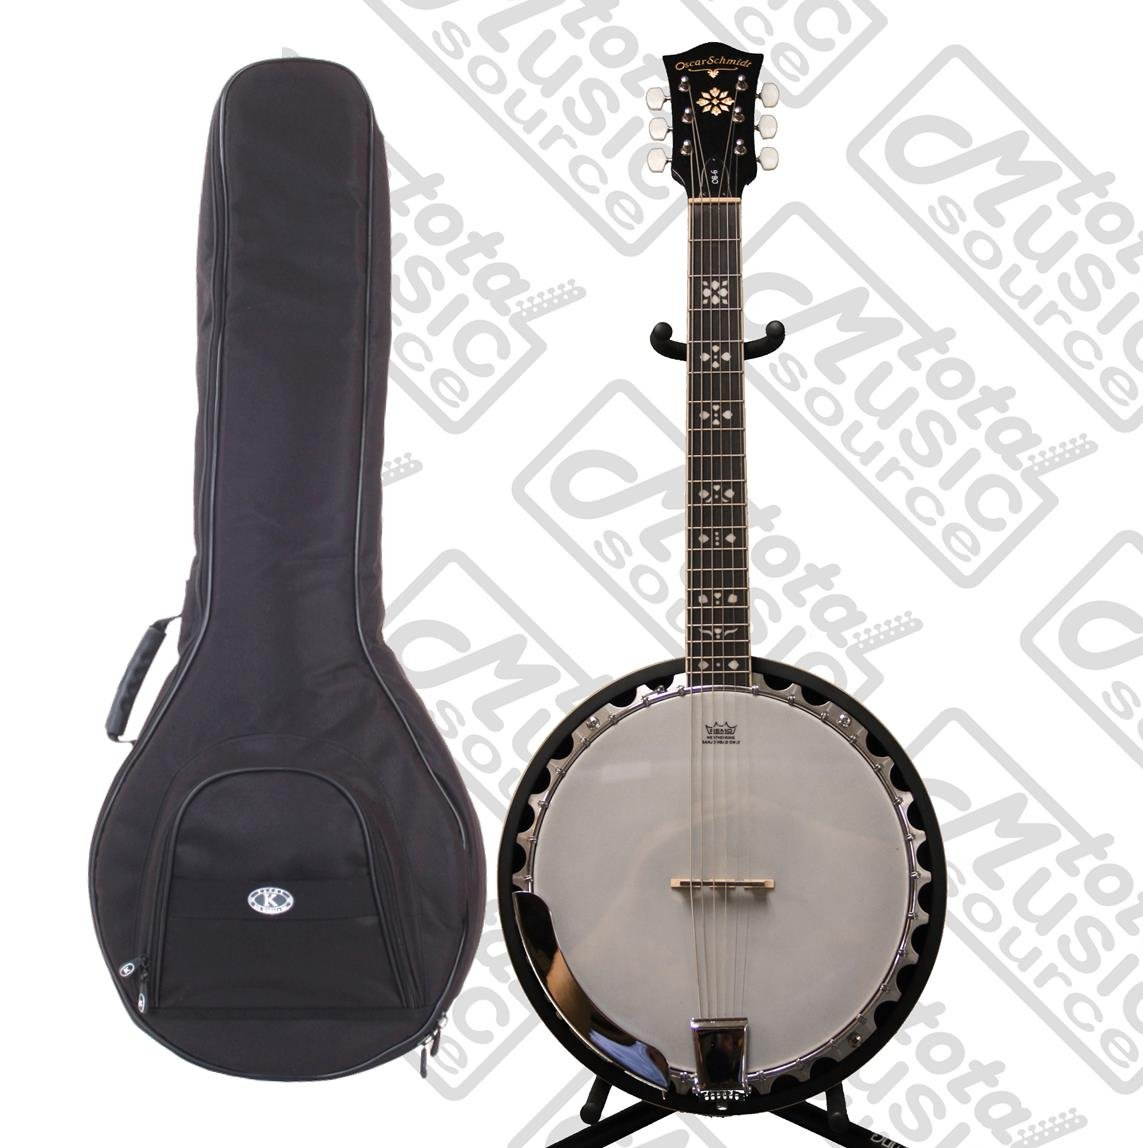 Oscar Schmidt 6-String Banjo, Remo Head, Mahogany Resonator GIG BAG POLISH CLOTH, OB6 KBBU